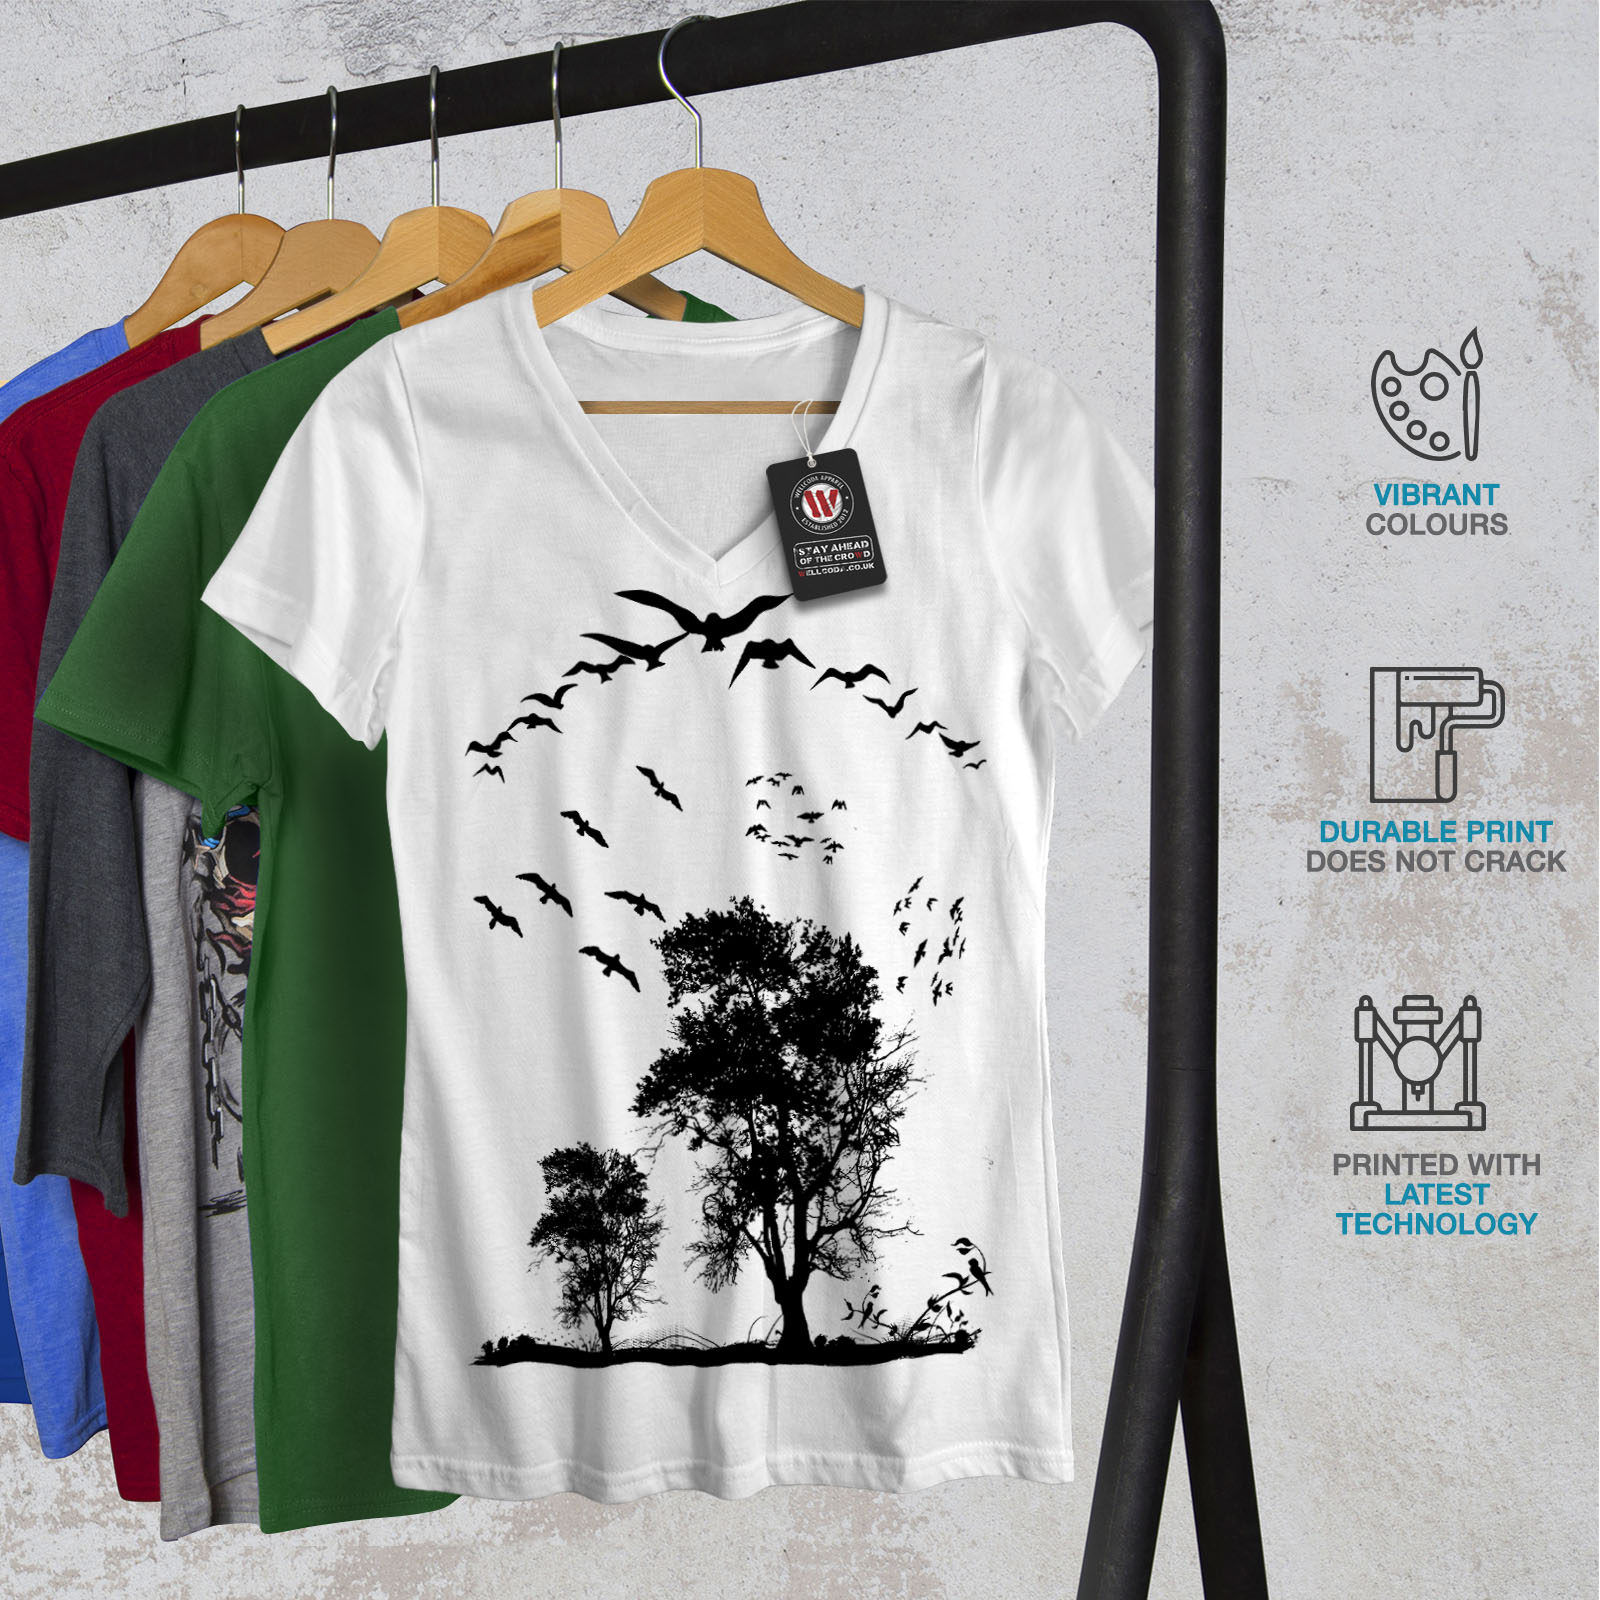 thumbnail 8 - Wellcoda-Bird-Freedom-Fly-Womens-V-Neck-T-shirt-Nature-Graphic-Design-Tee